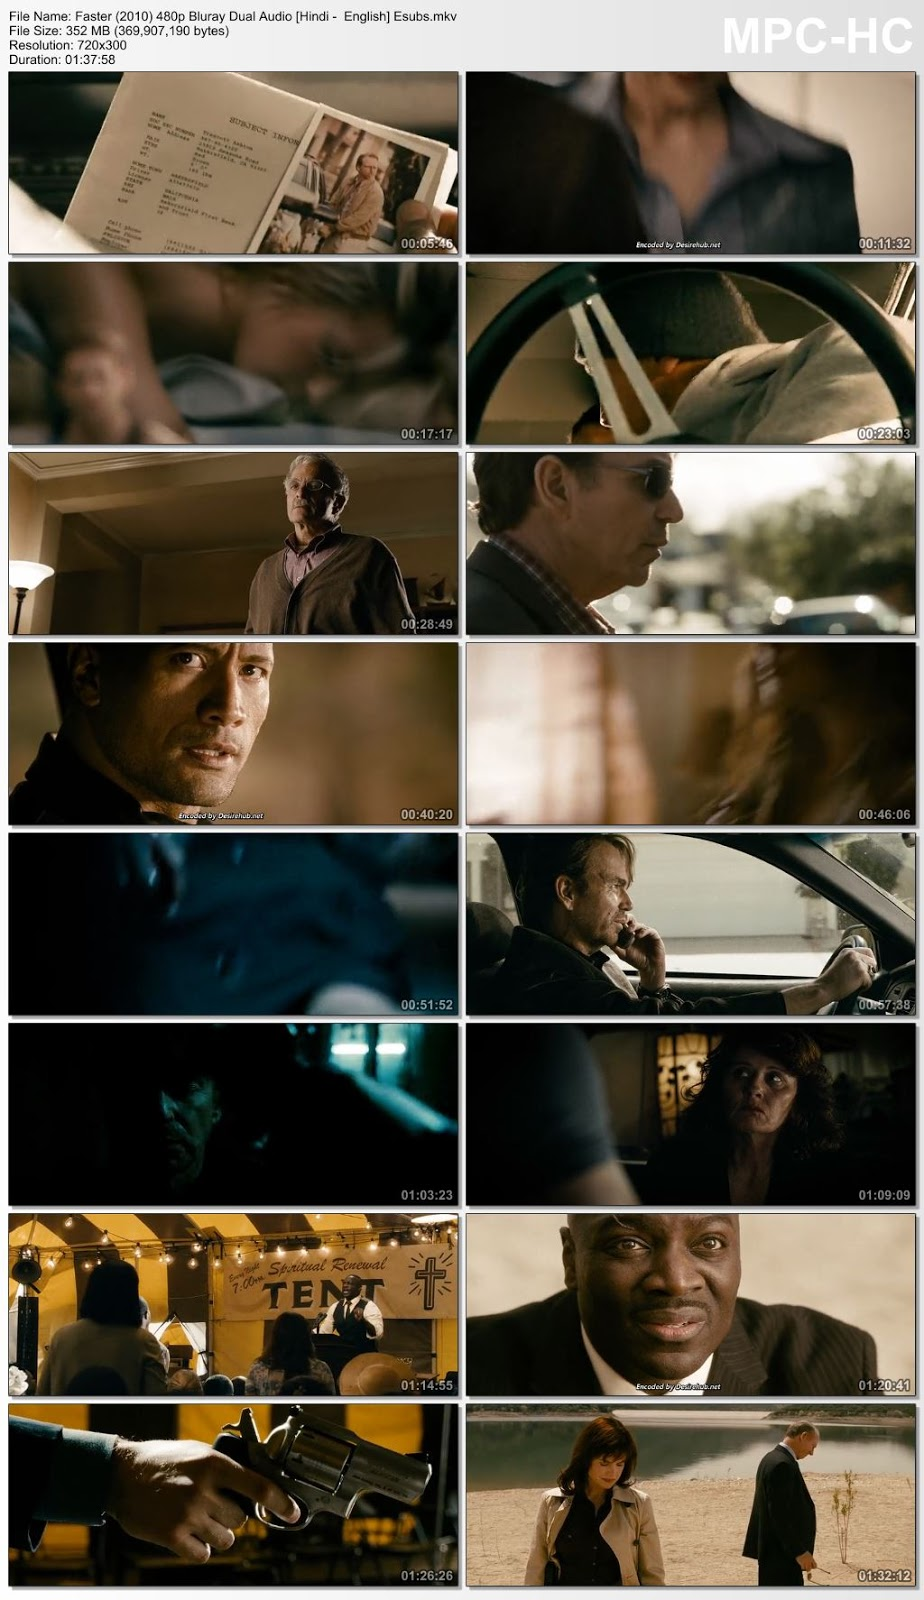 Faster (2010) 480p BluRay Dual Audio [Hindi – English] ESubs 350MB Desirehub